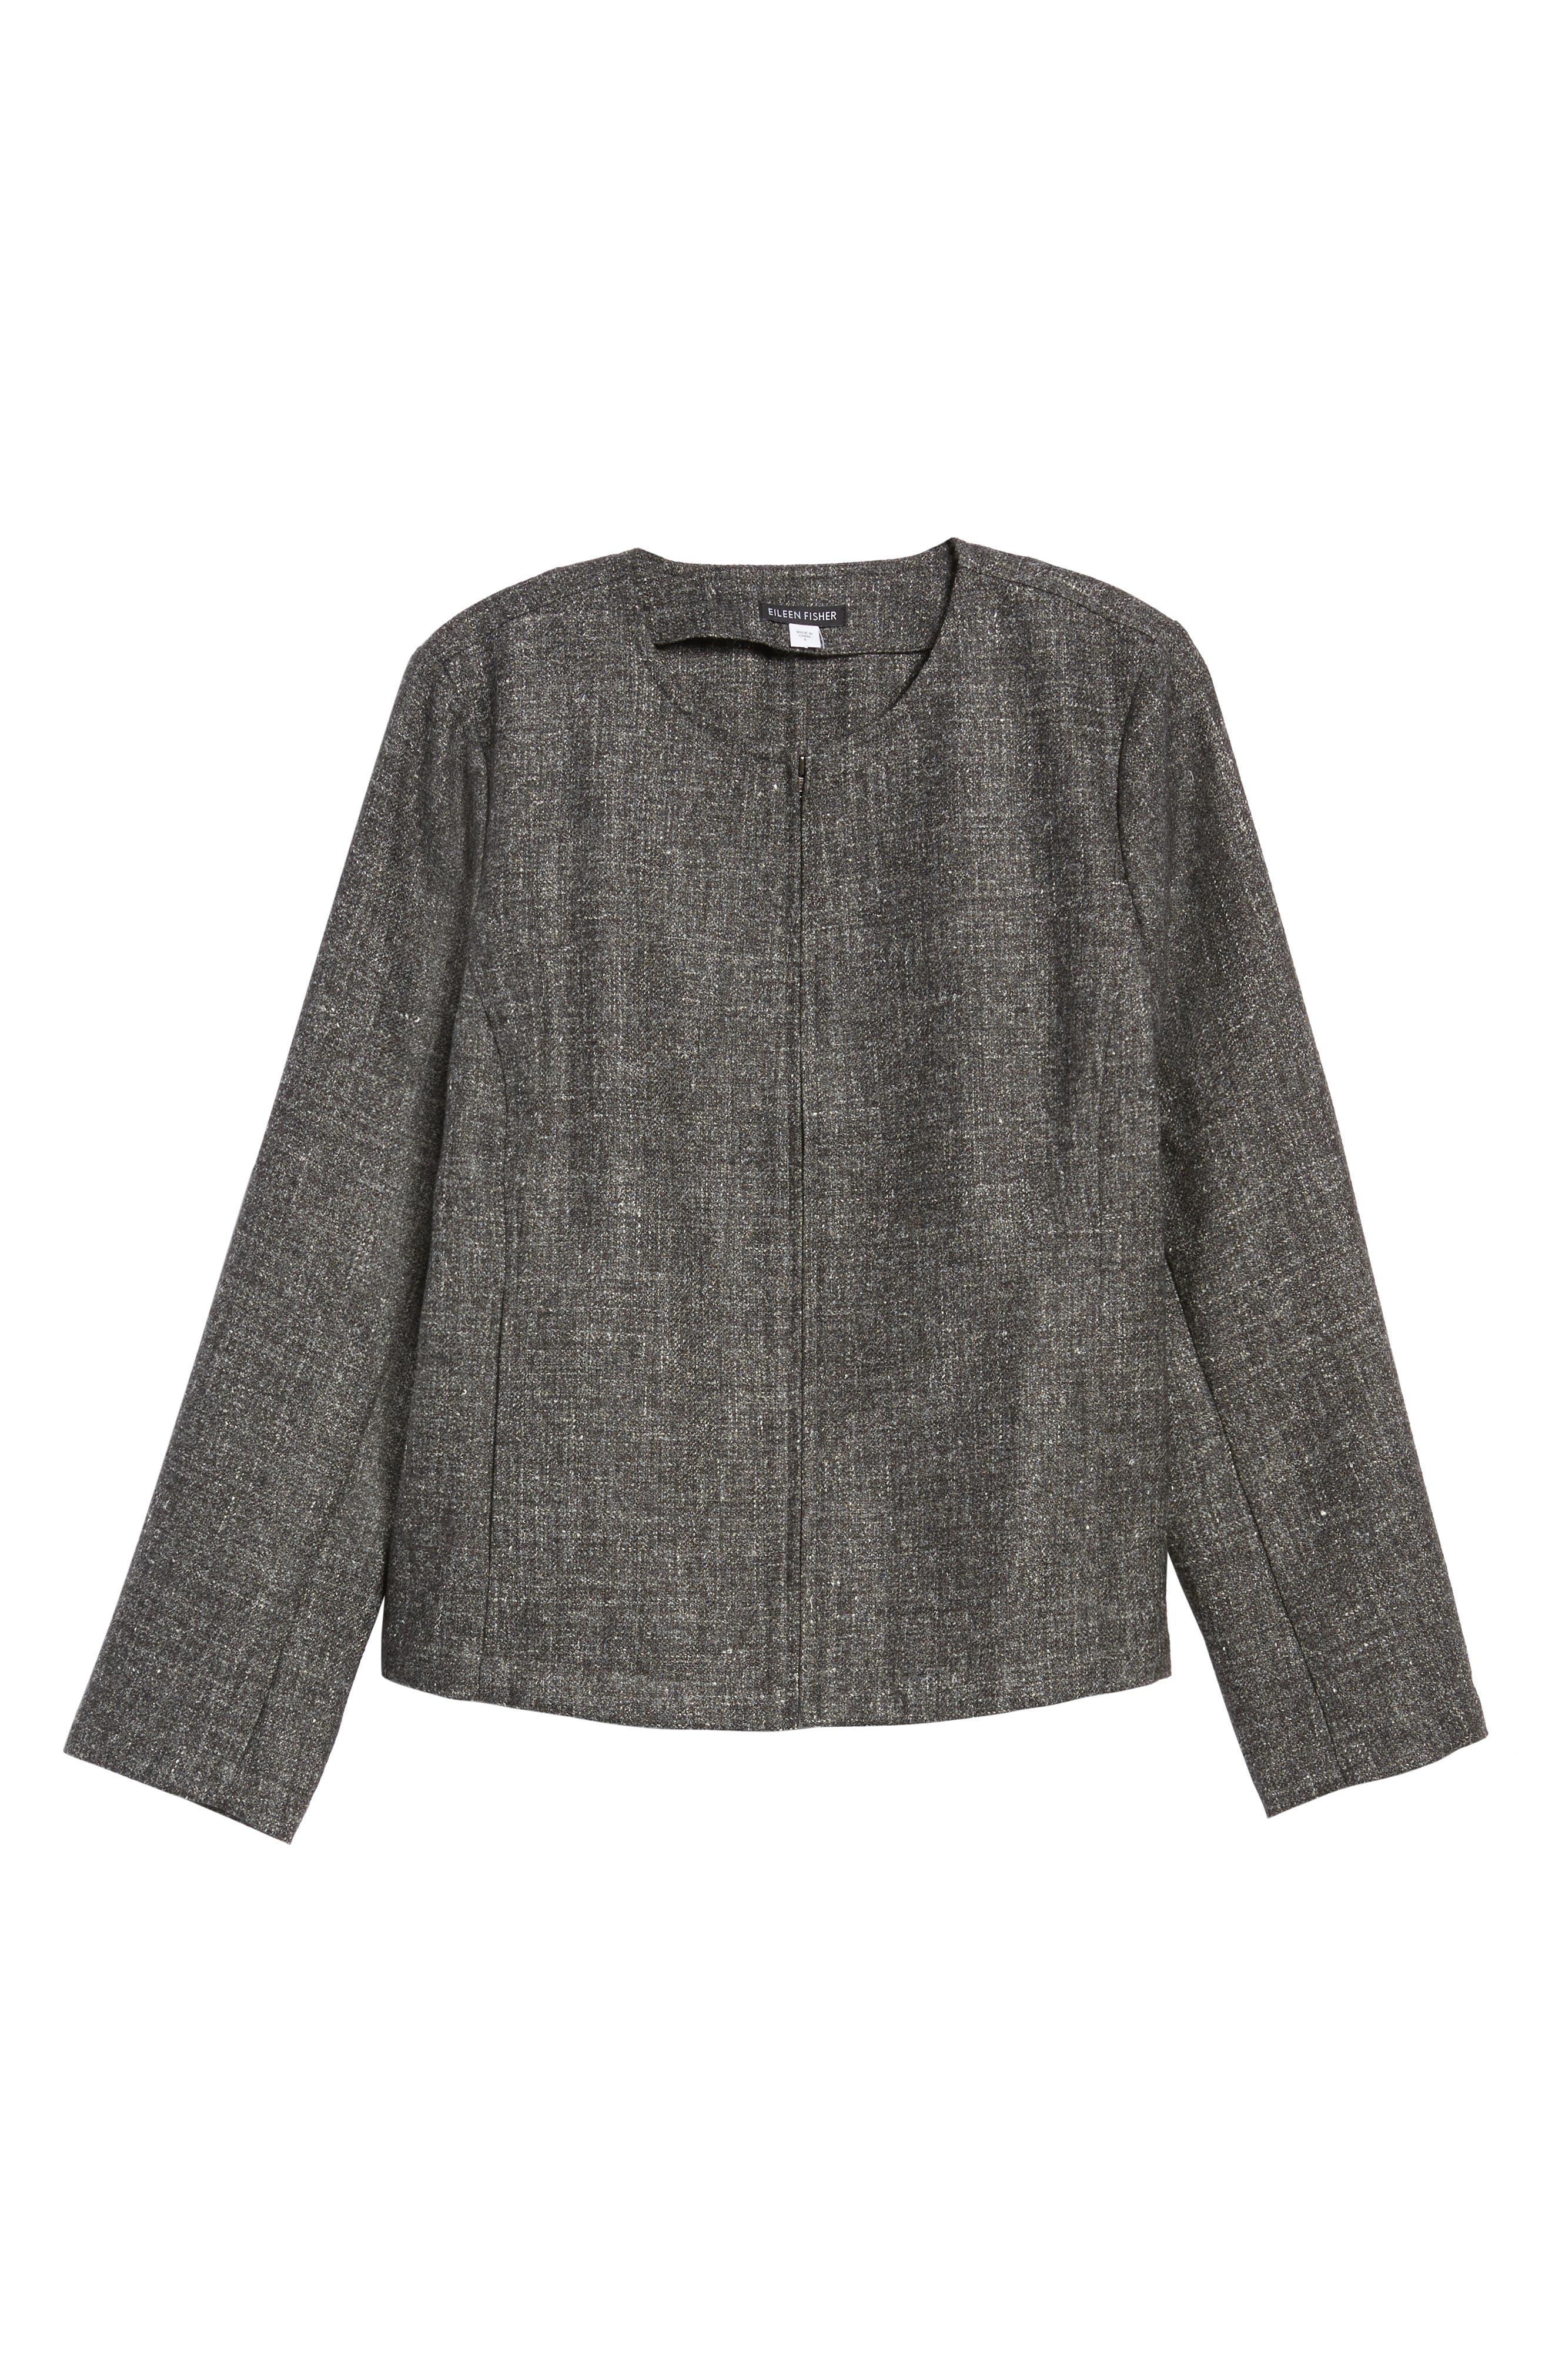 Tweed Jacket,                             Alternate thumbnail 6, color,                             Charcoal